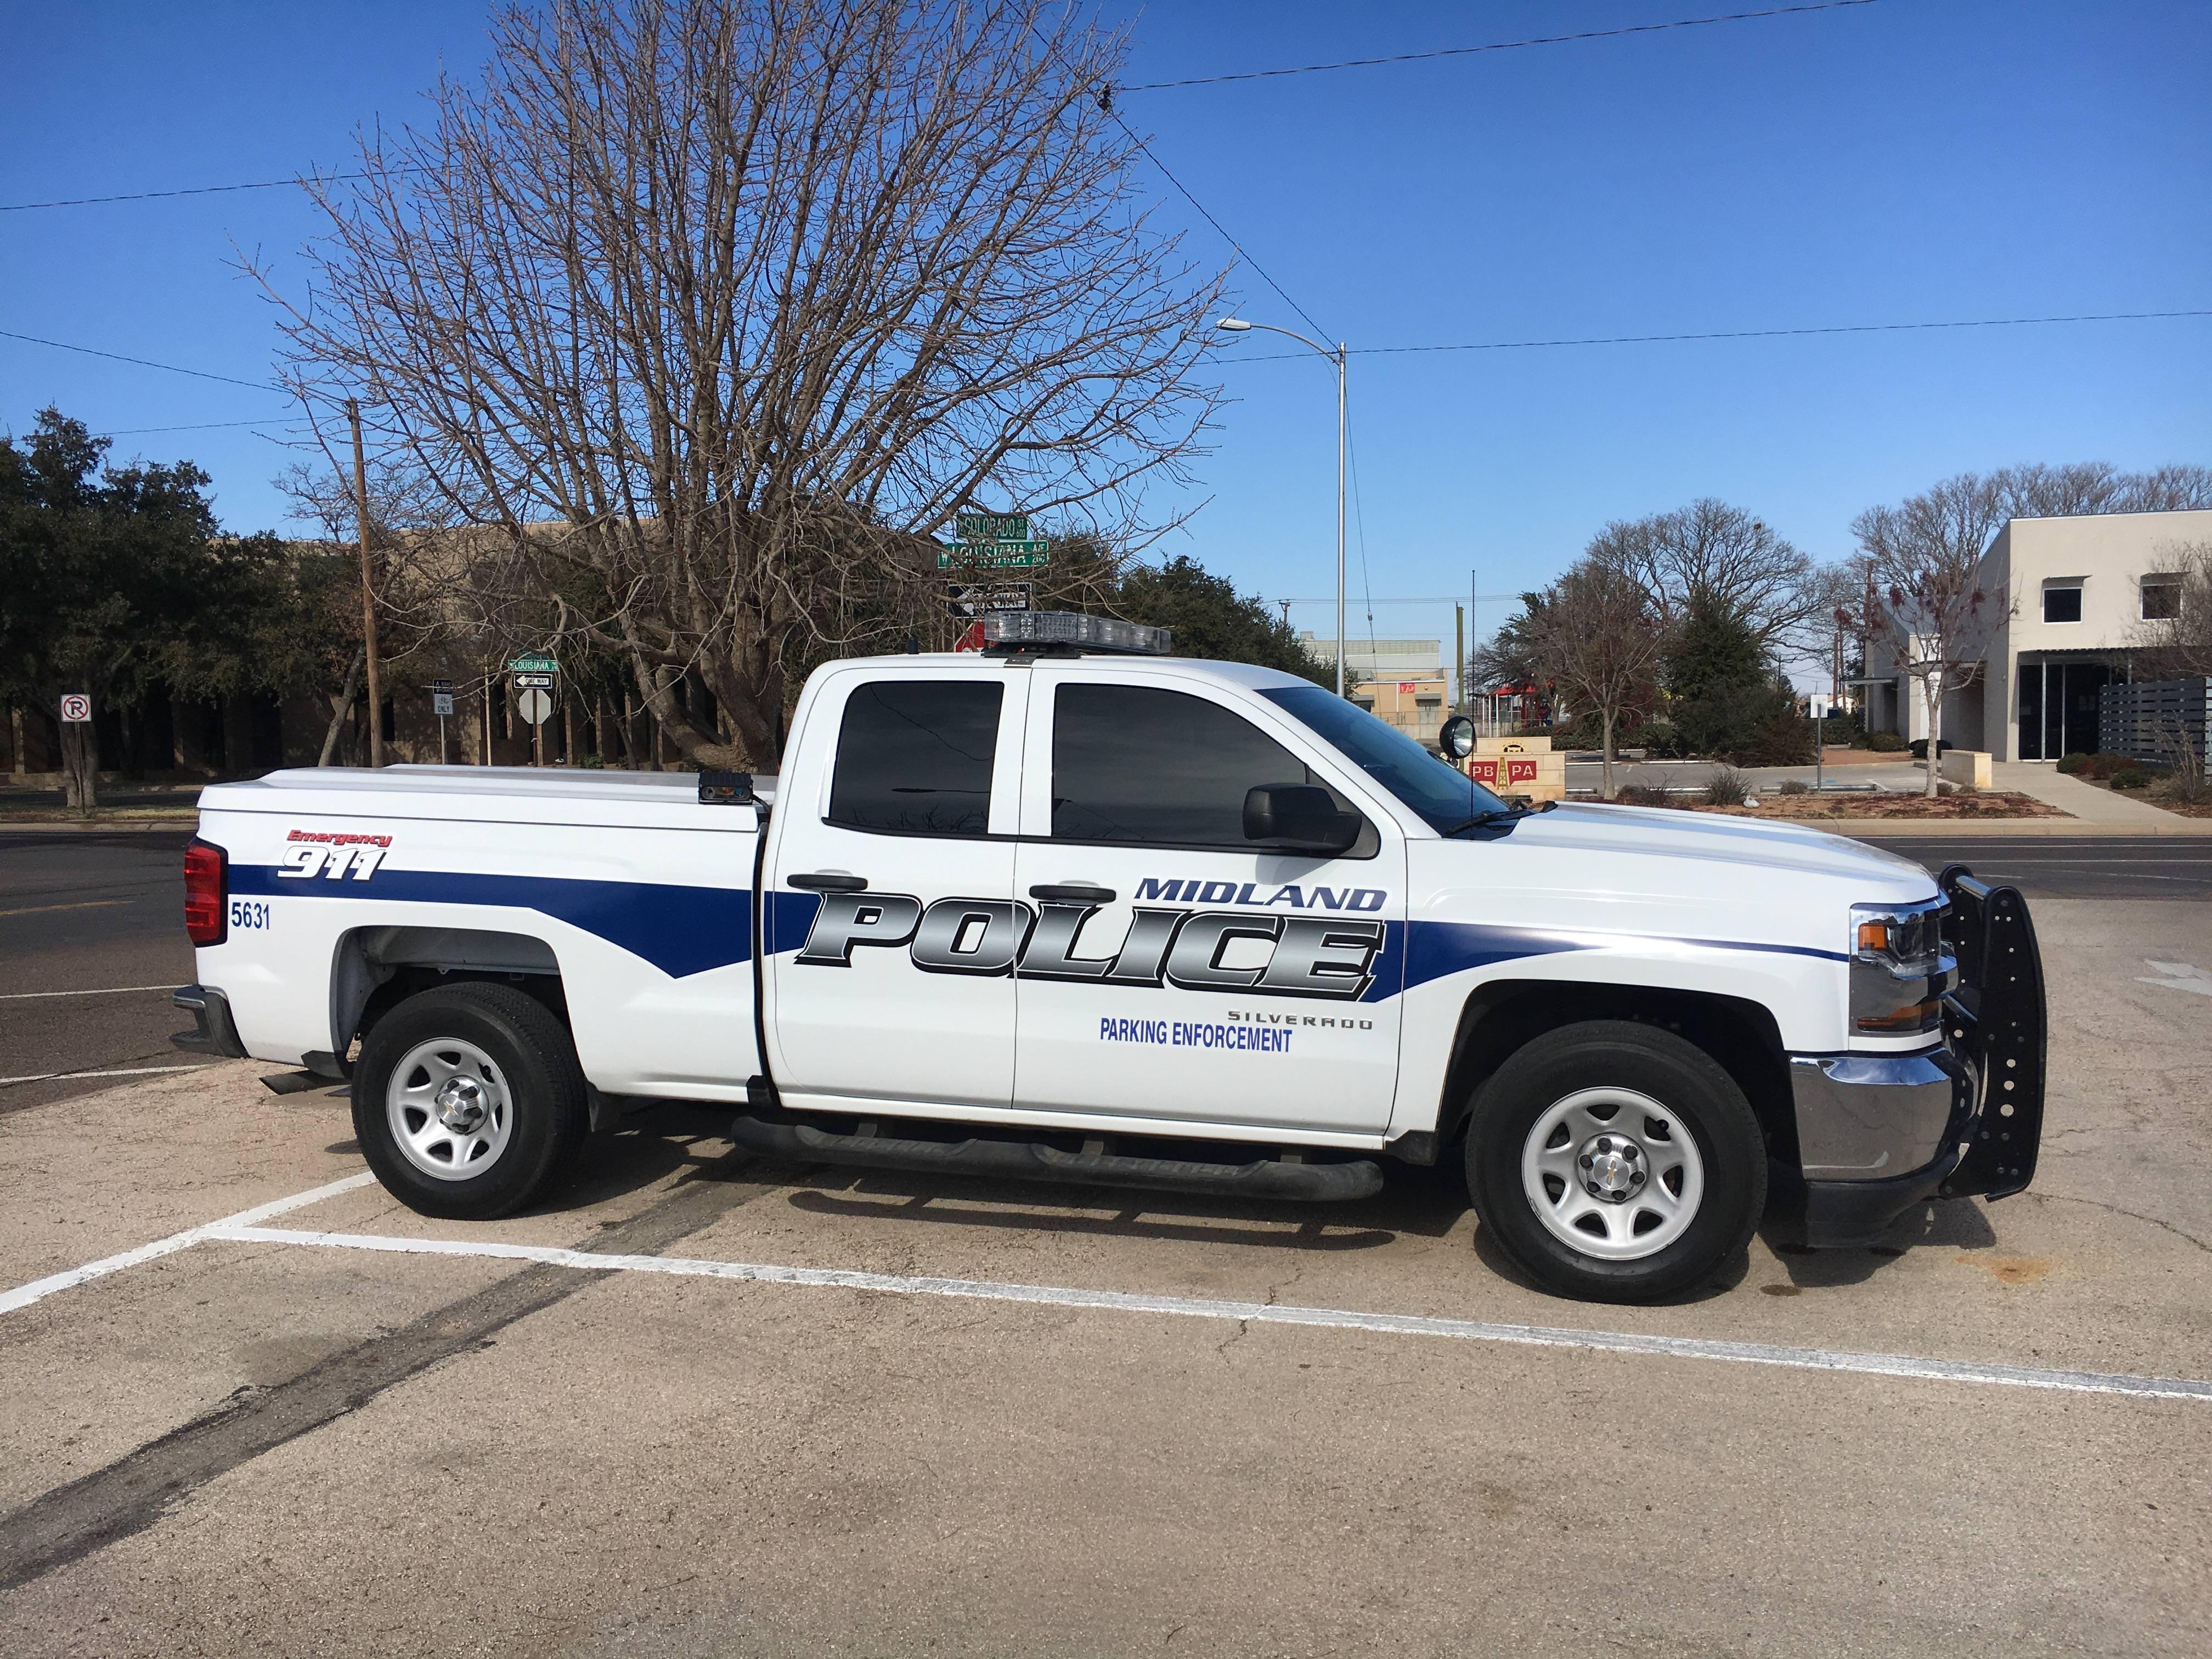 tx trucks near weststar for sale texas autoplex midland gmc chevrolet